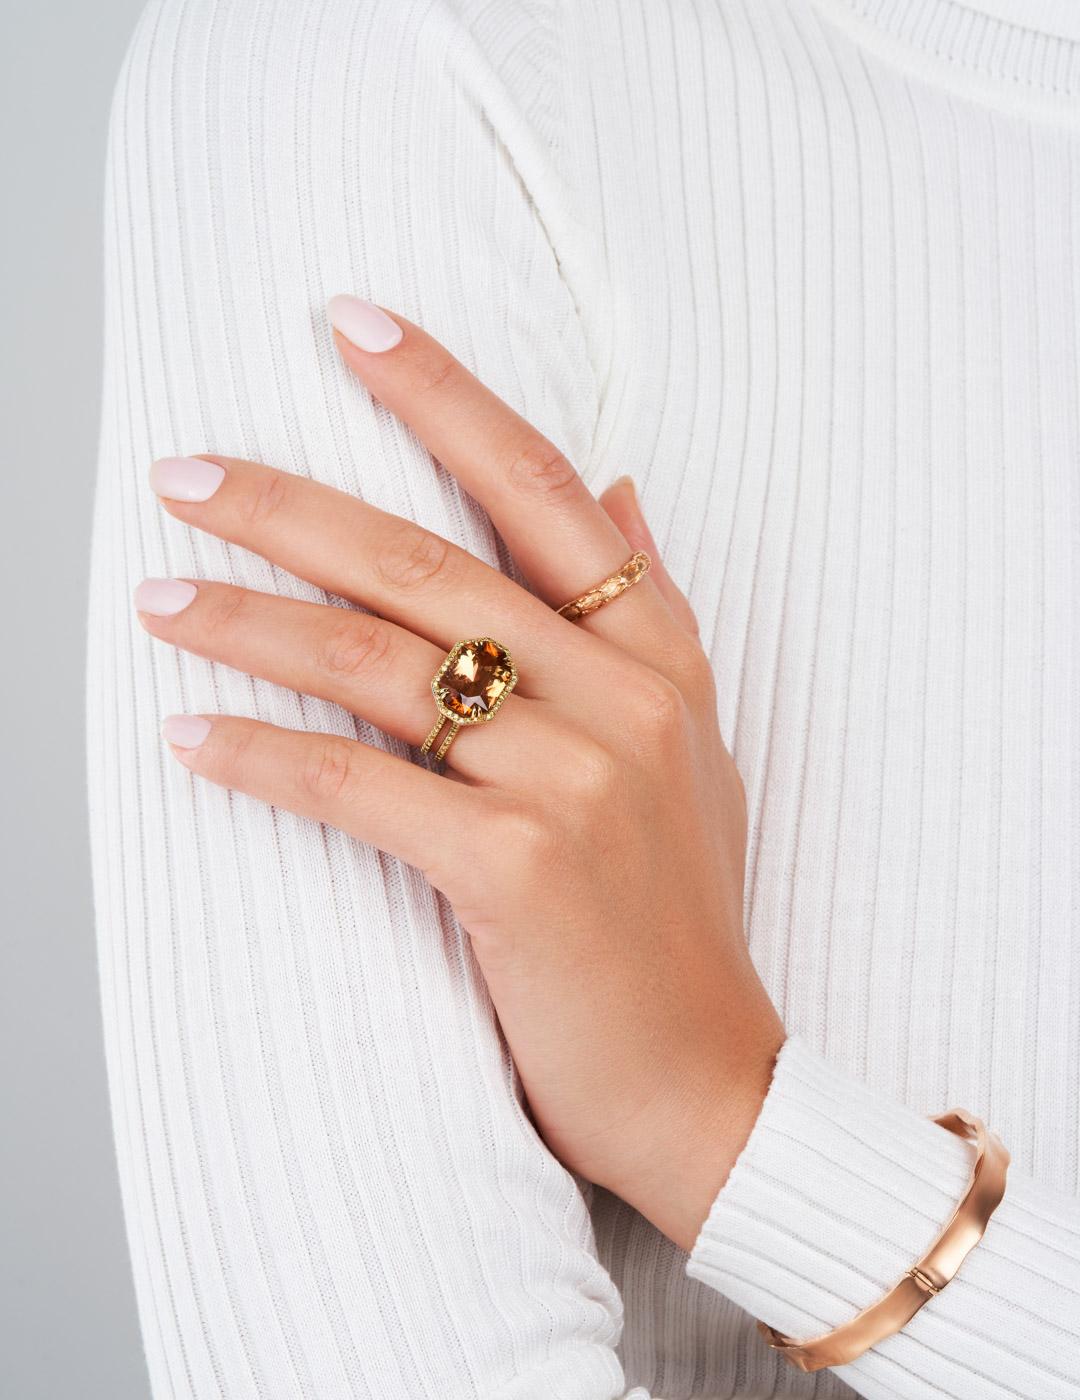 mish_jewelry_product_Bond-Bow-Bangle-2